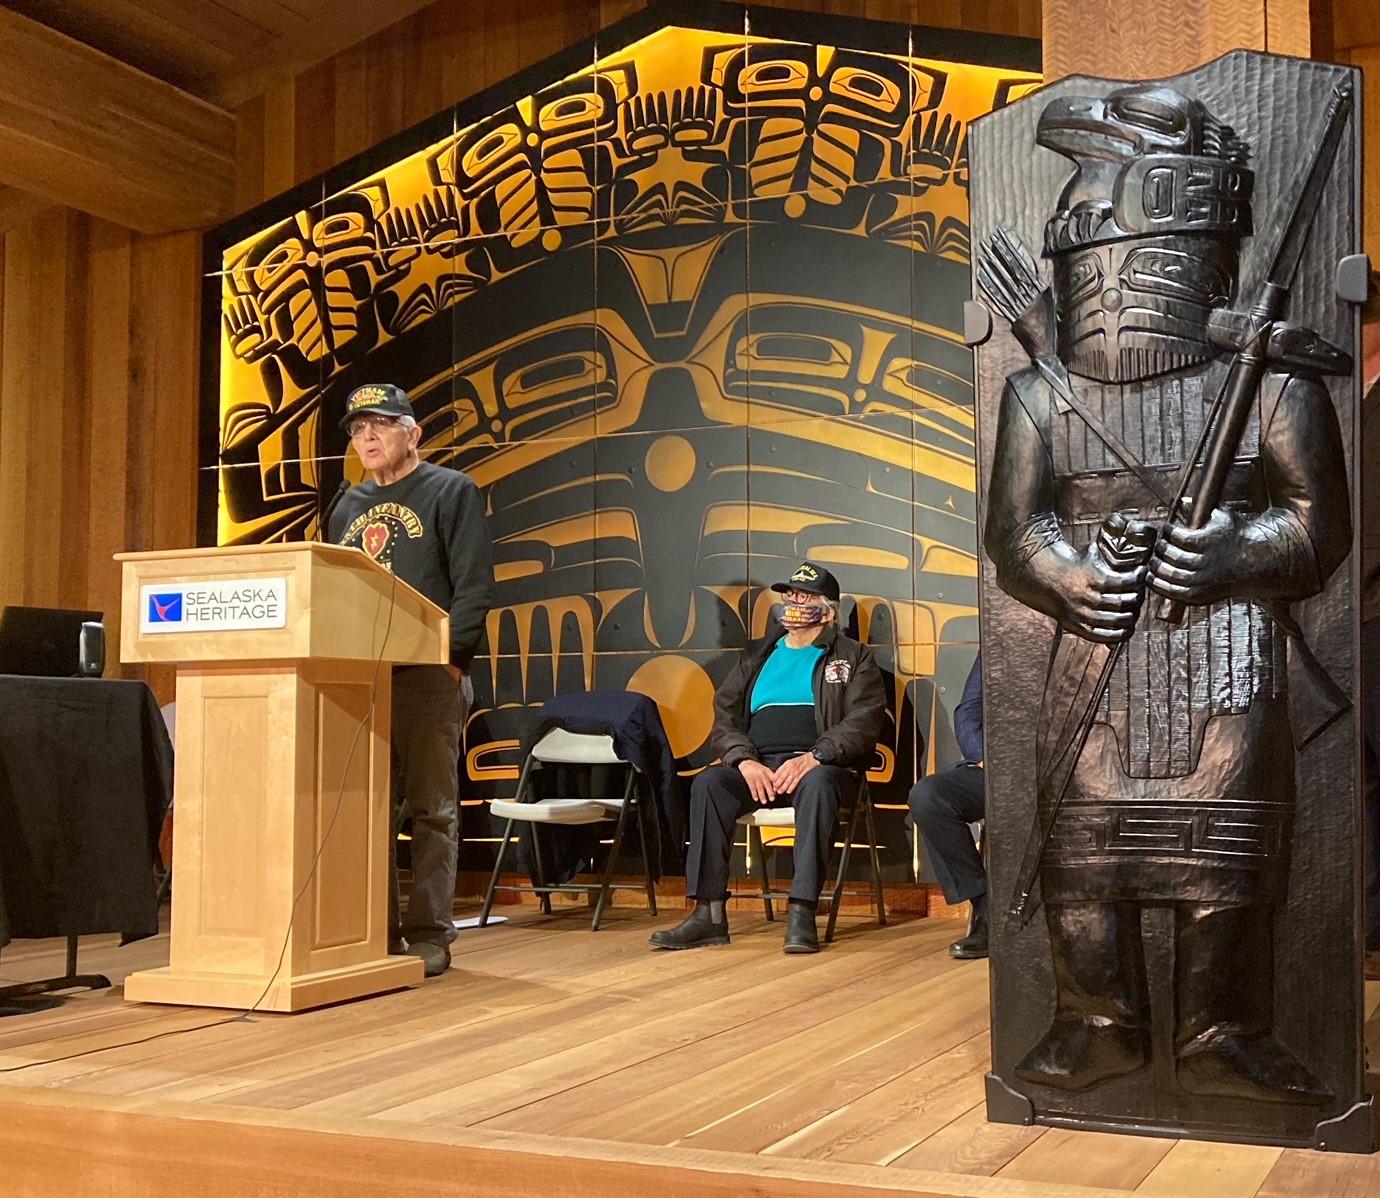 Alaska Native veterans of Vietnam War, heirs would receive state land under Gov. Dunleavy proposal